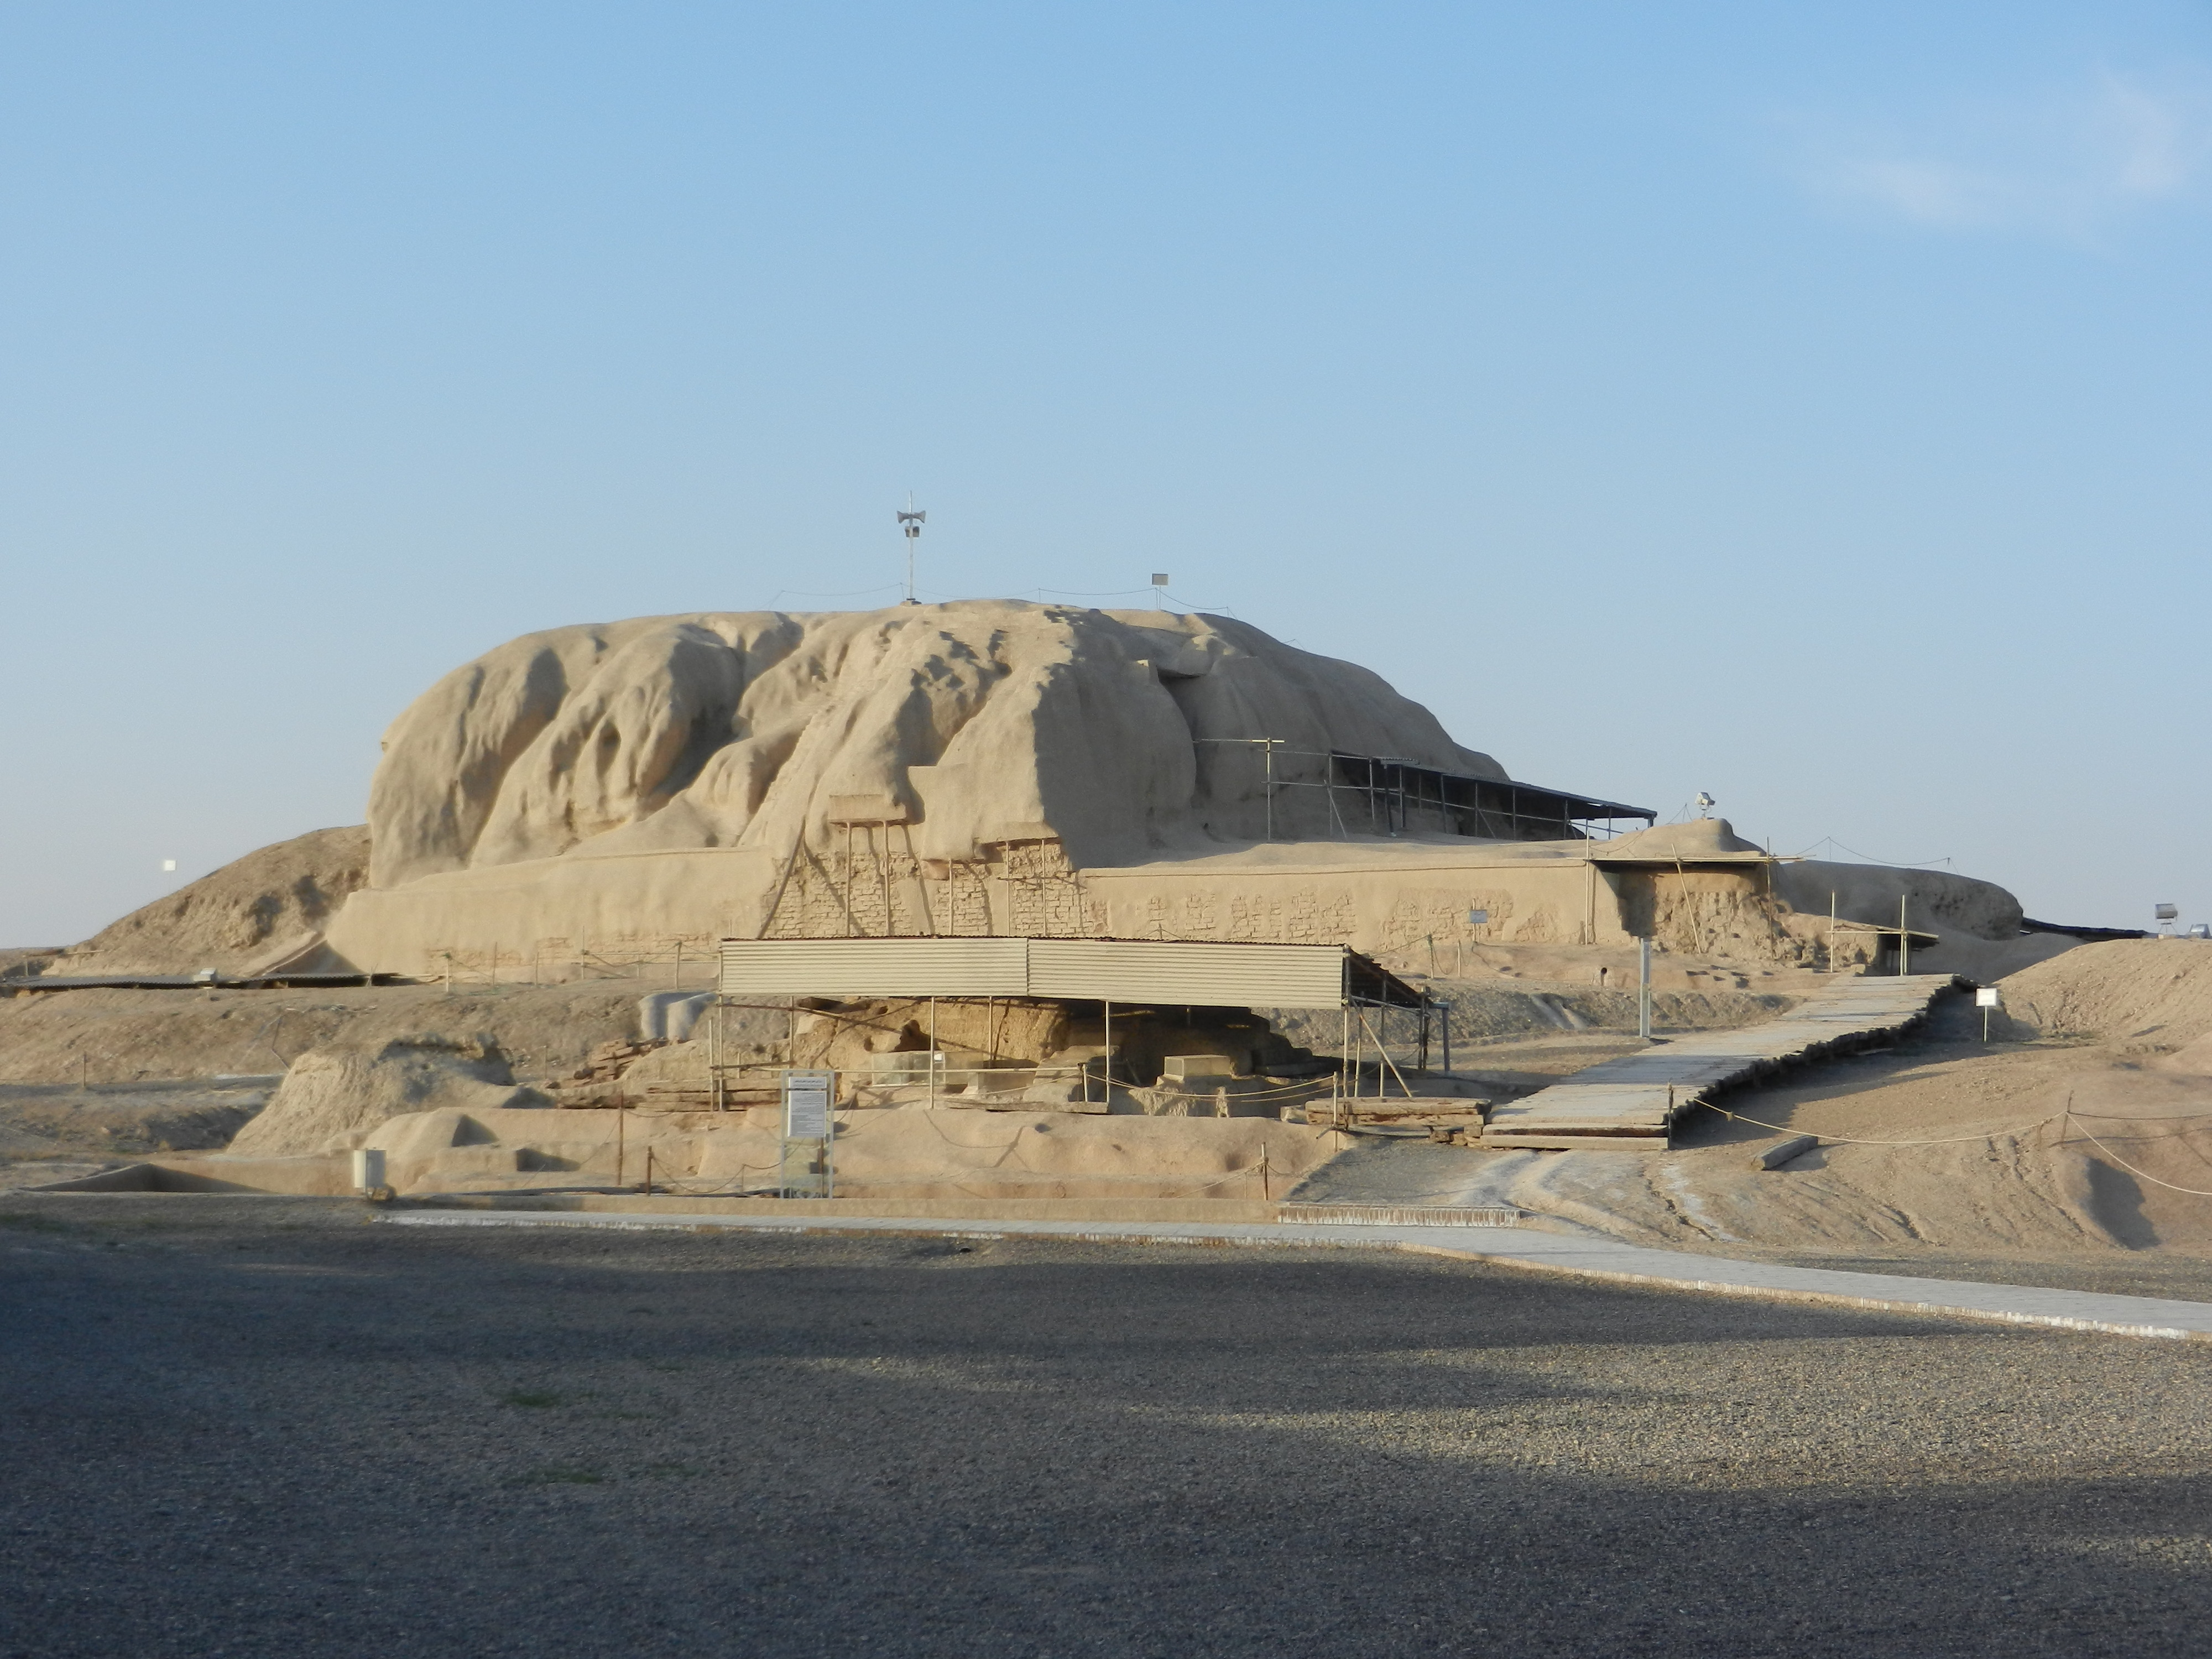 Tepe Sialk Ziggurat